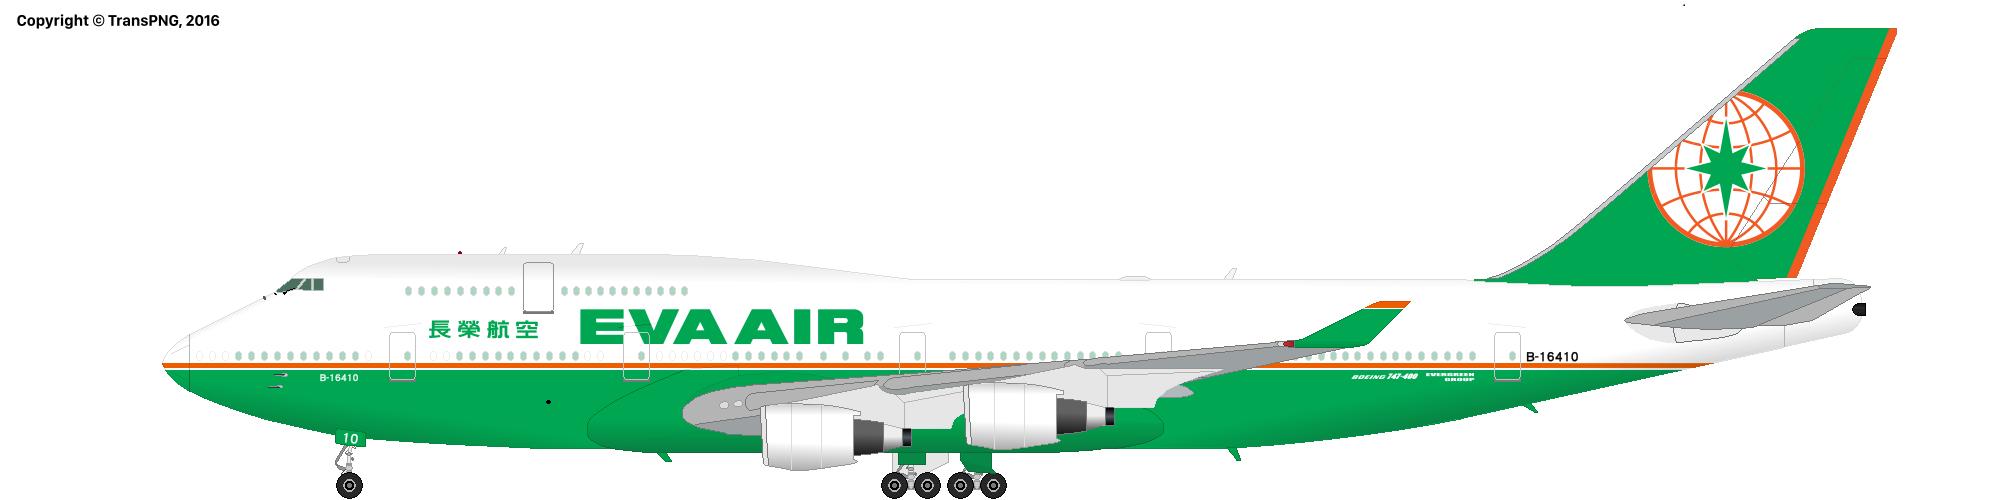 Airplane 6201